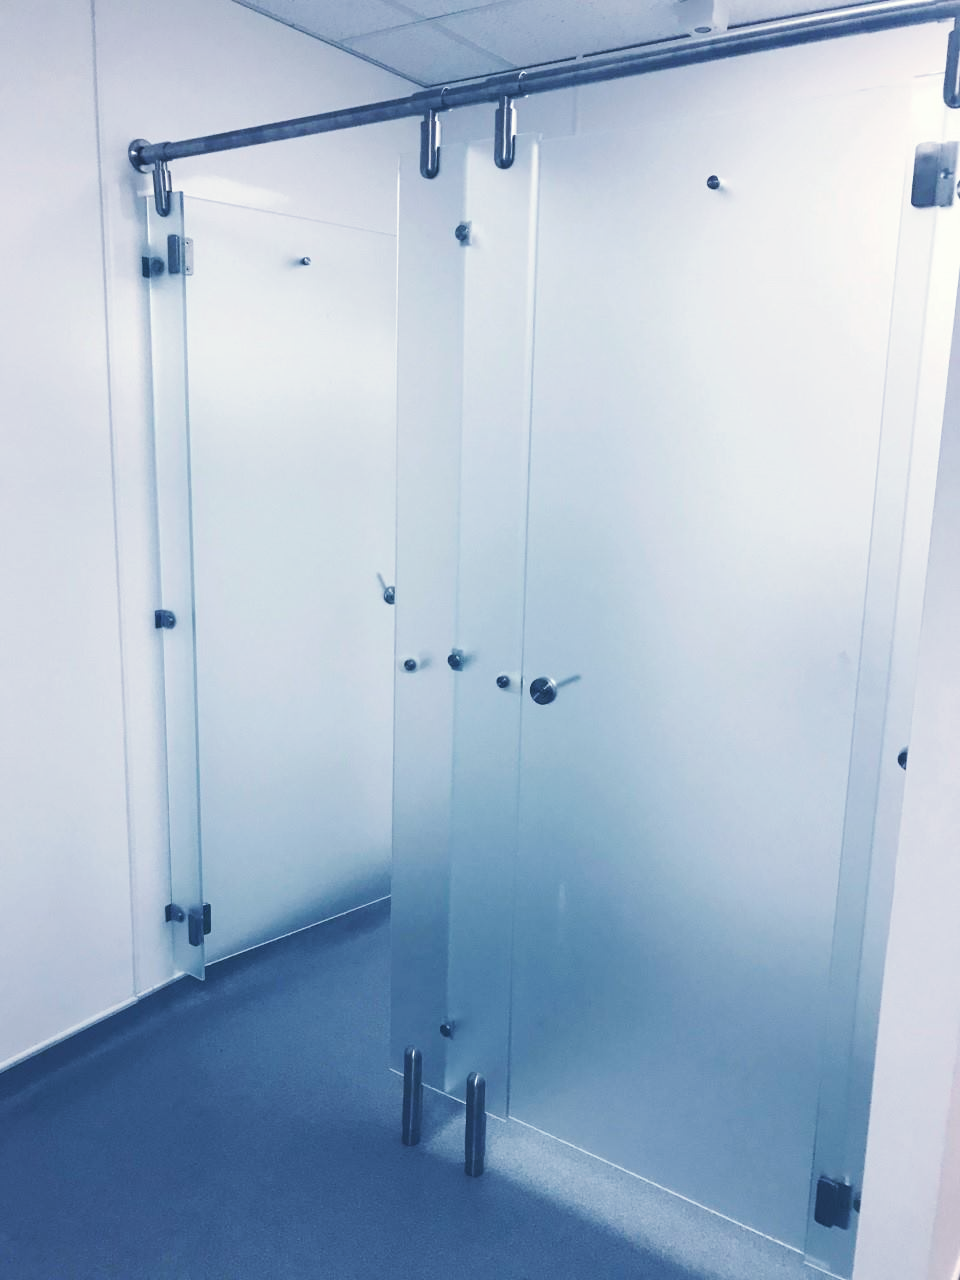 Fitness centre shower refurbishment